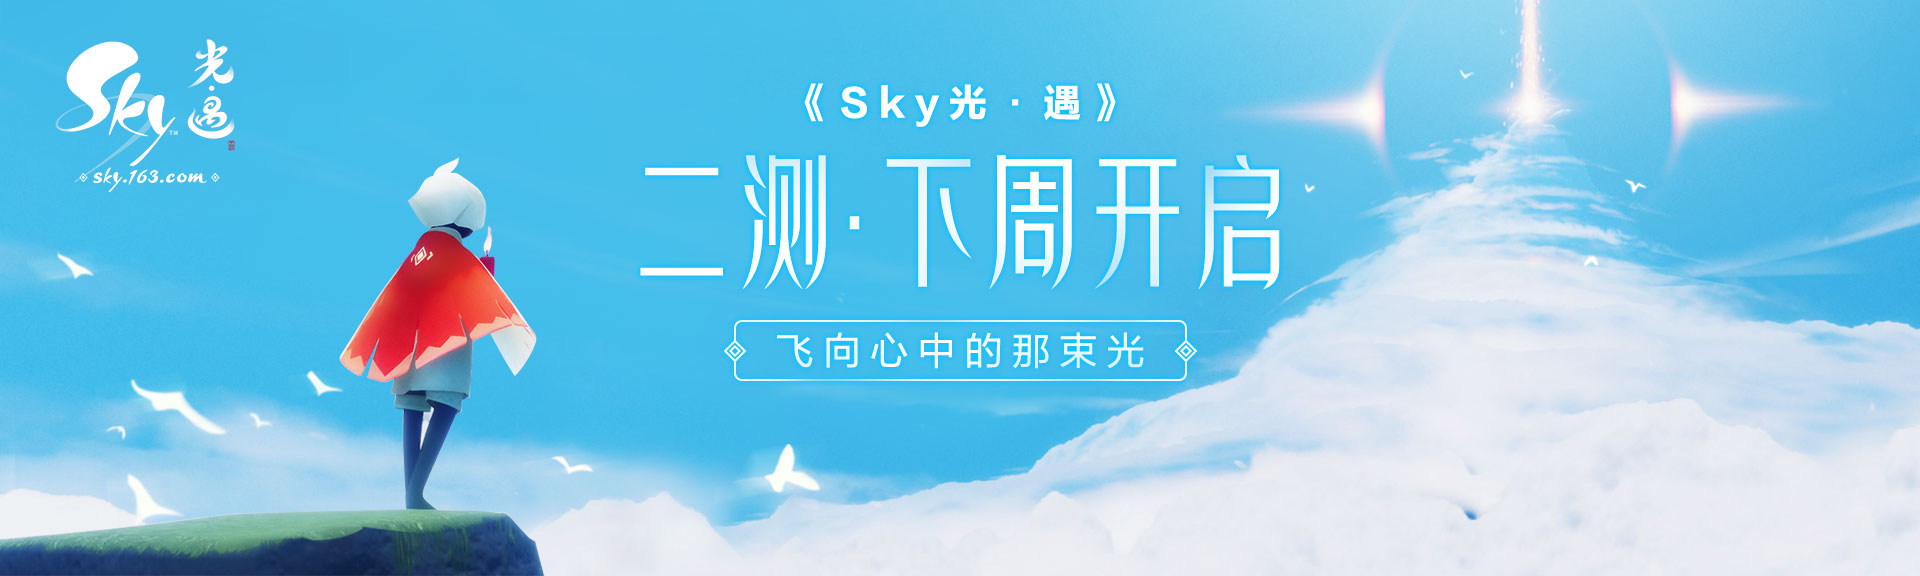 《Sky光·遇》二测下周开启,飞向心中的那束光